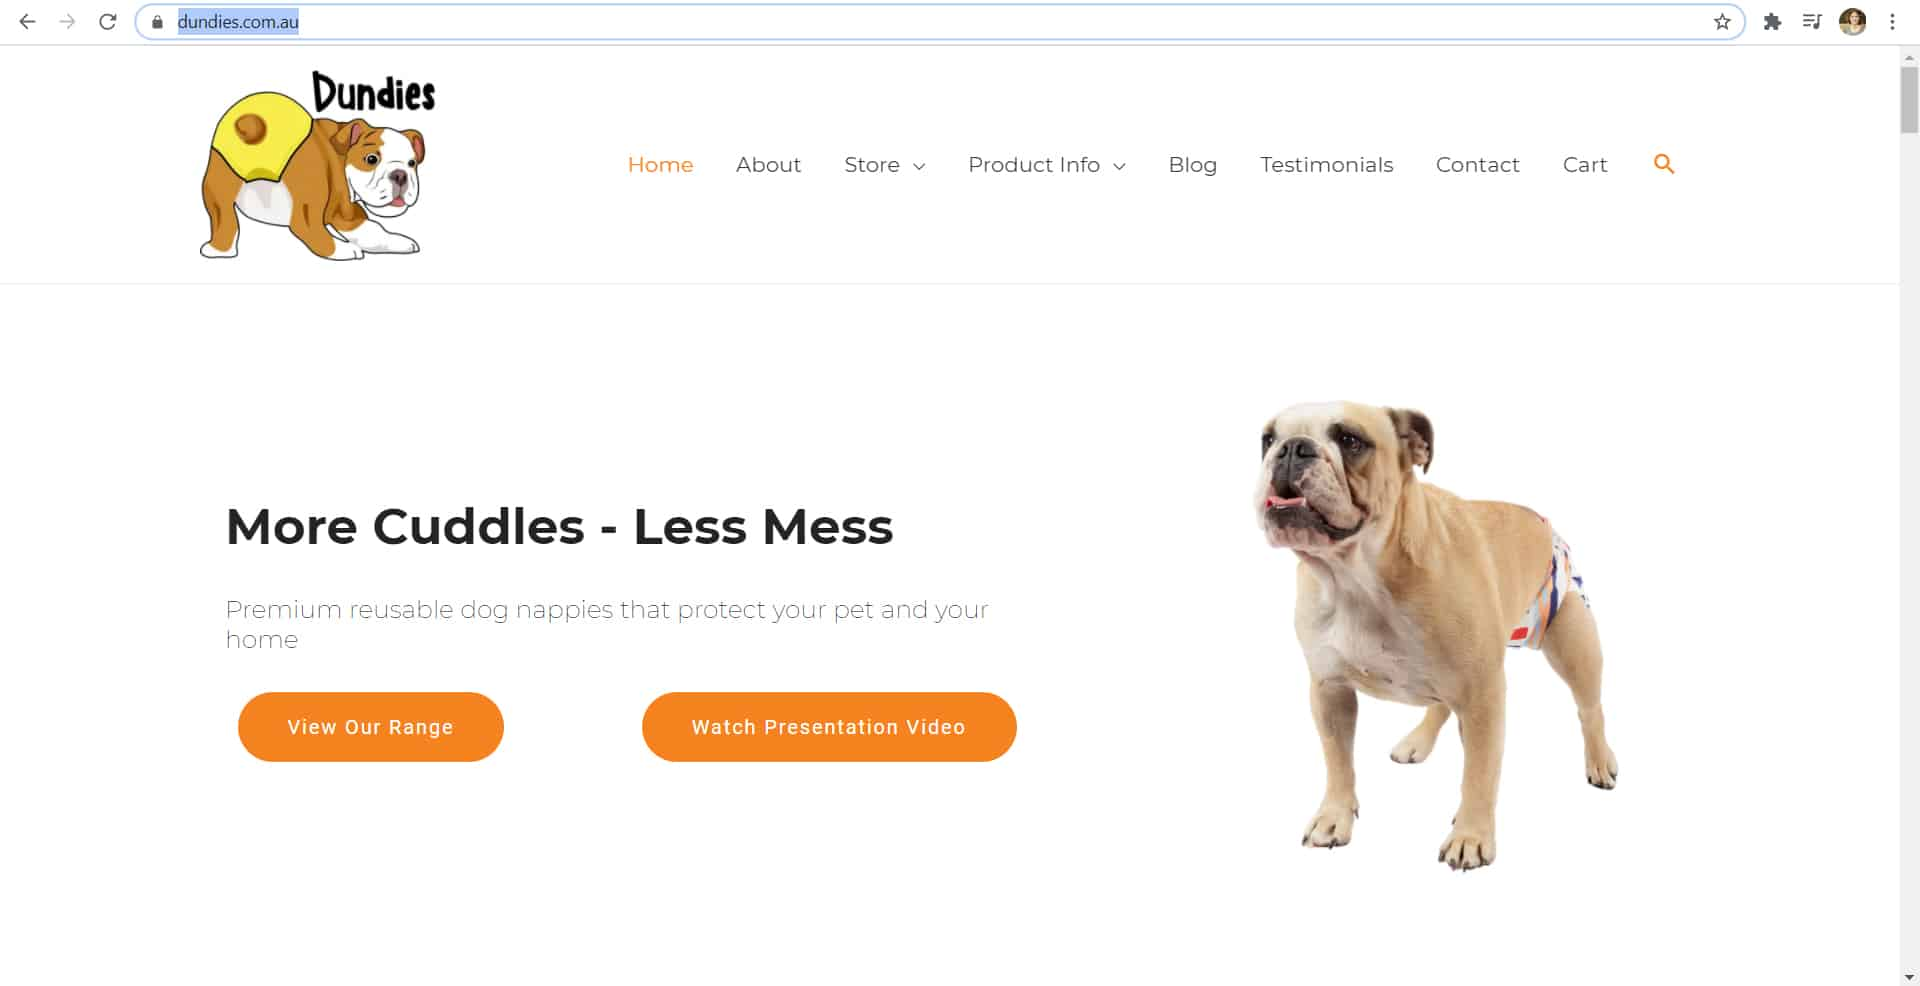 Dundies New Website - The Rural Copywriter